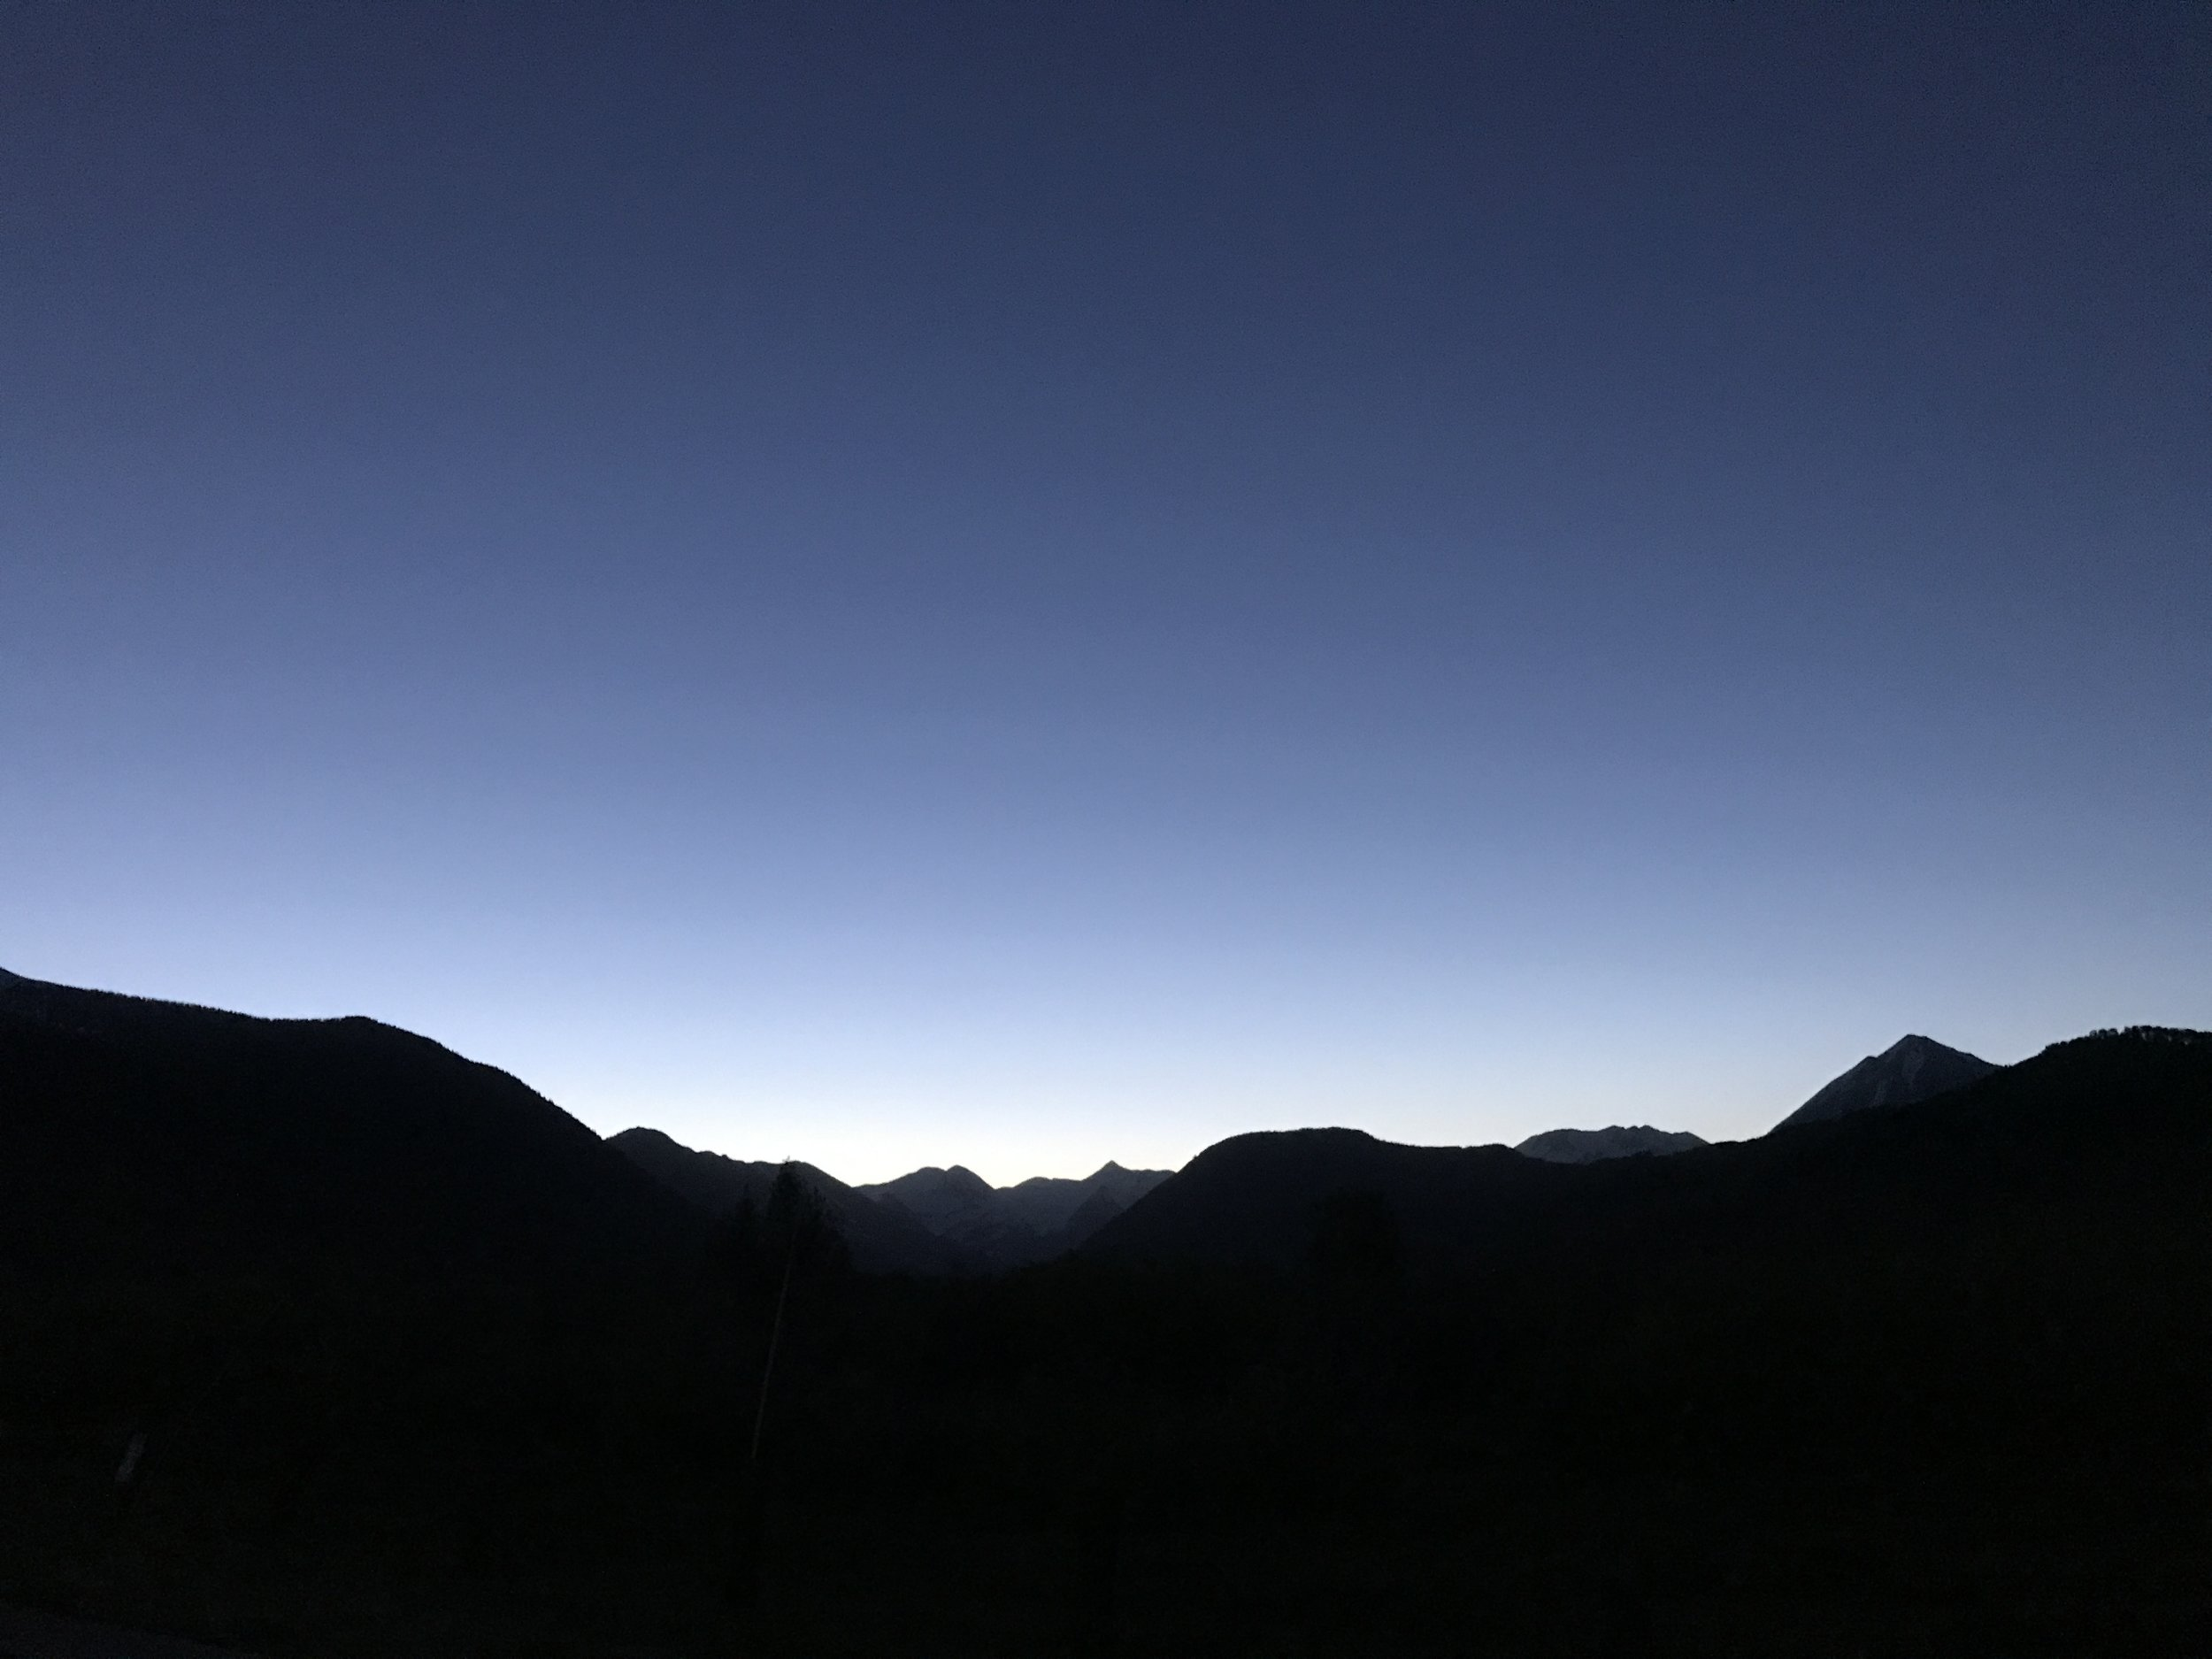 CO_night_mountain_line.JPG